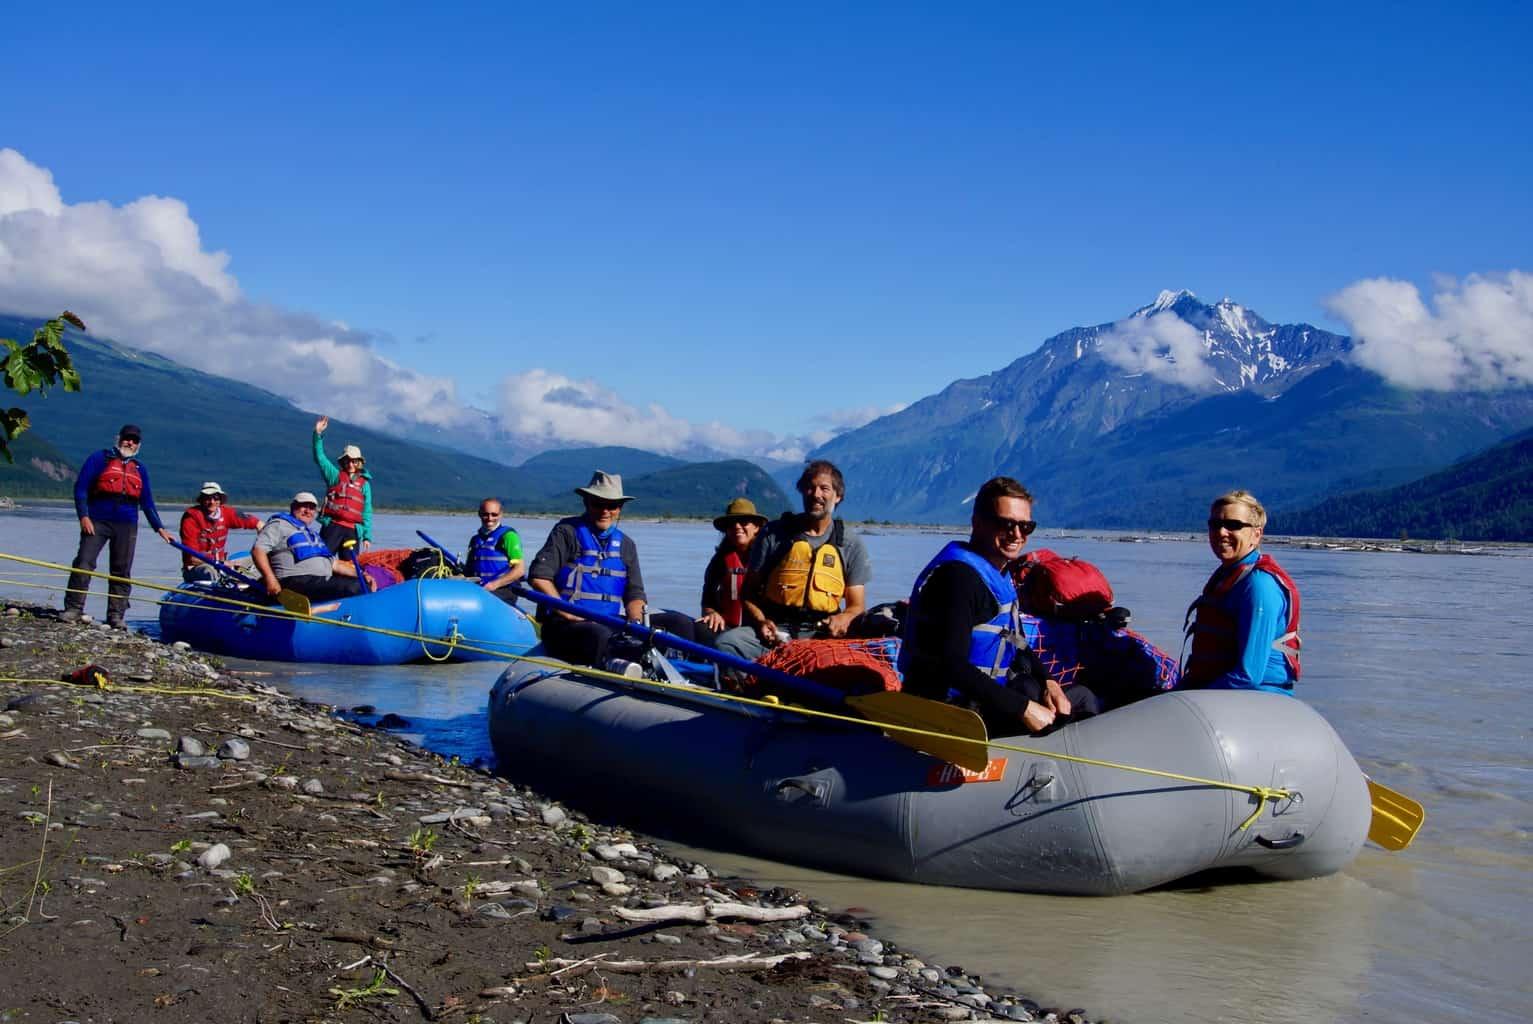 Reisegruppe beim Rafting in Alaska